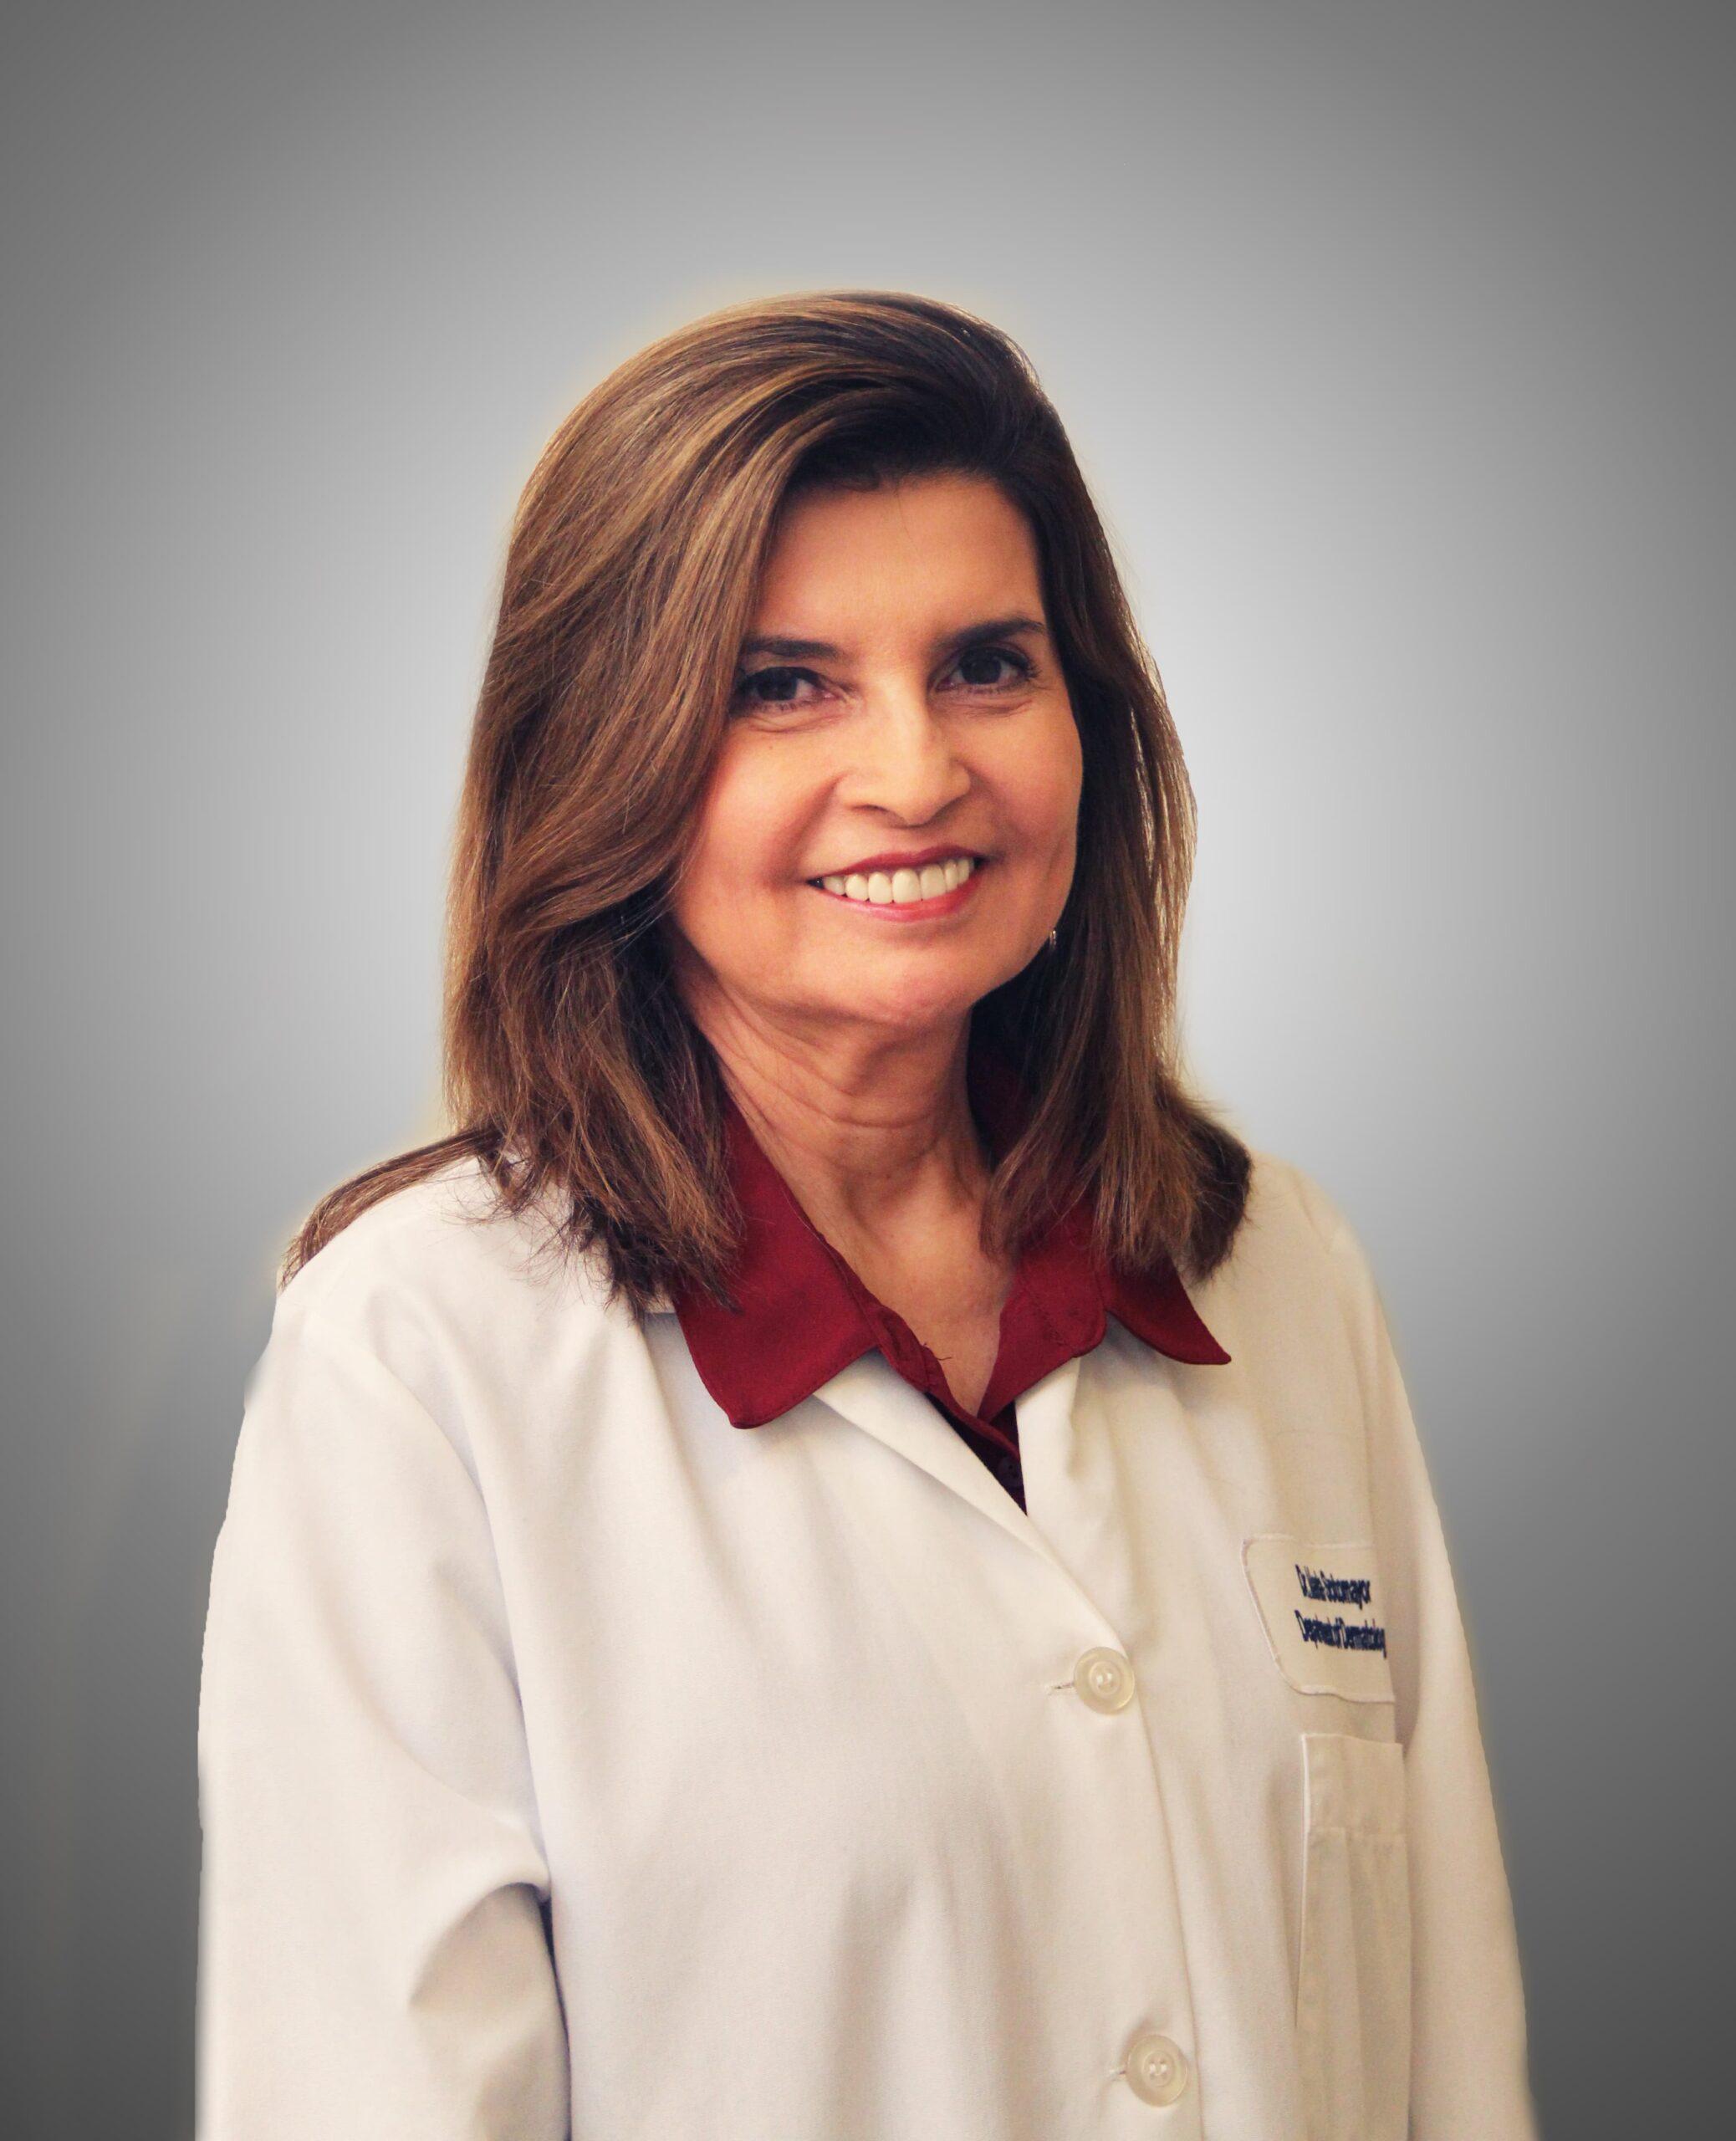 Dr. Maria G. Sotomayor